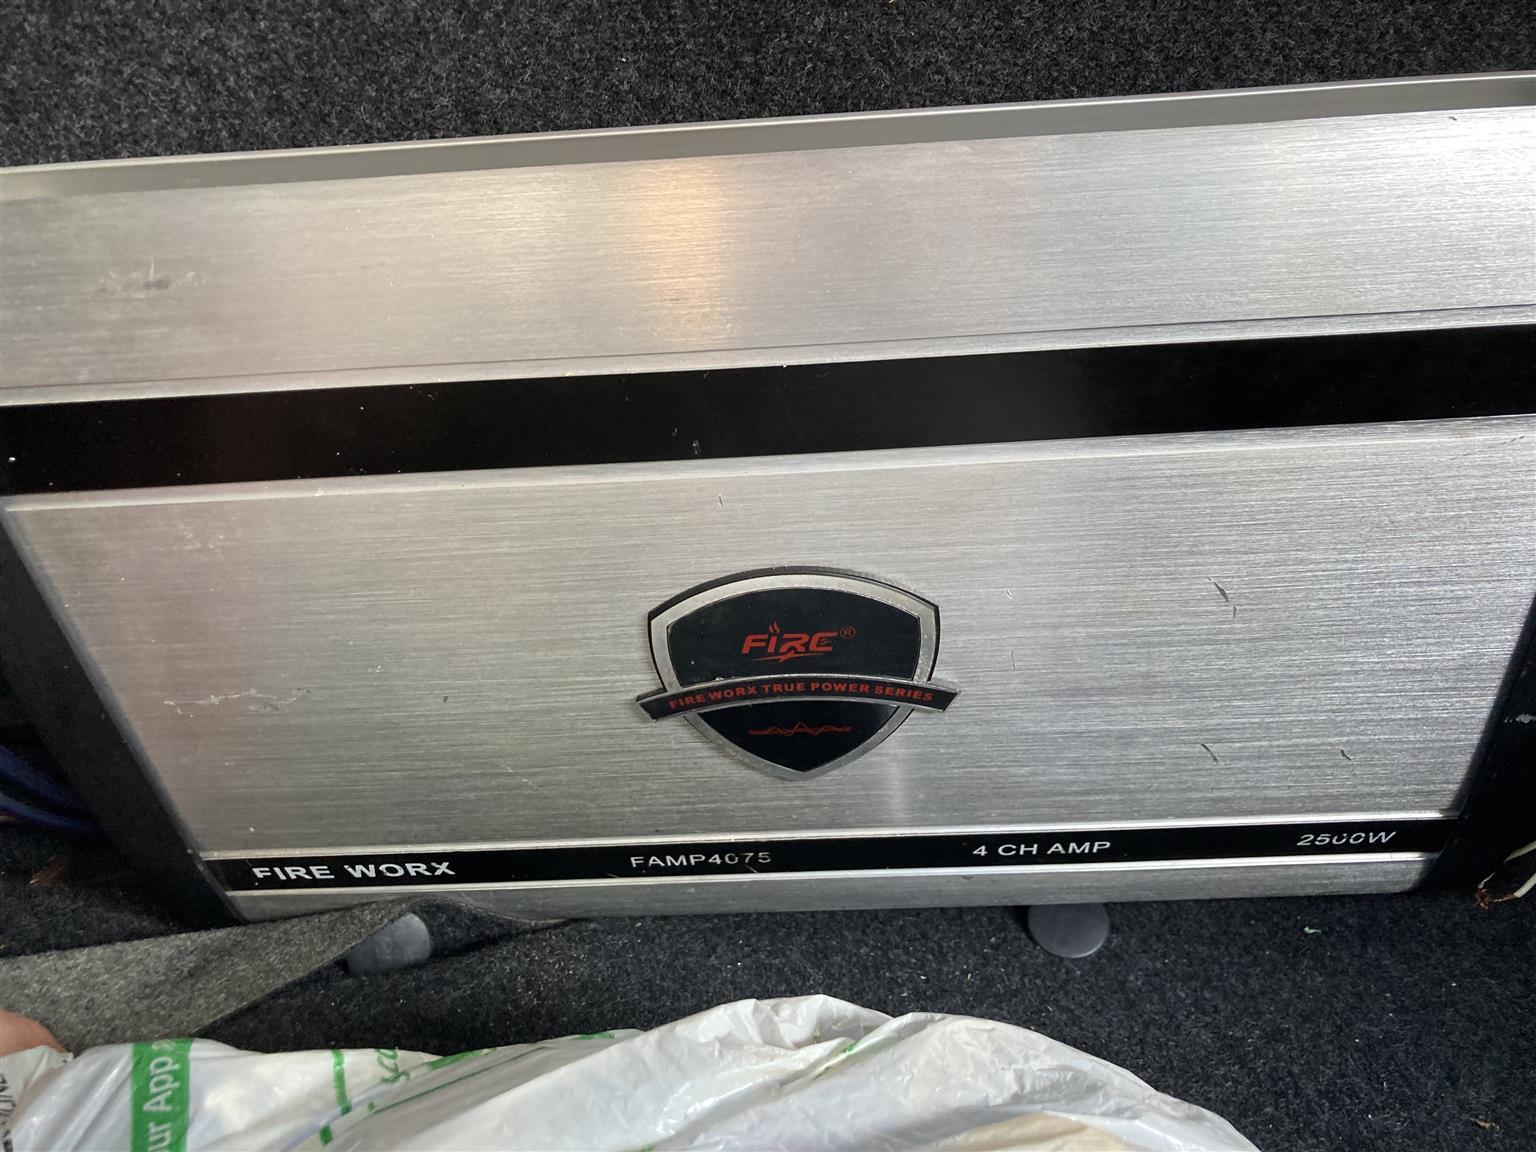 2500 watt fireworx 4ch amp, star sound 4ch class ab amp, 10inch pioneer champion series sub